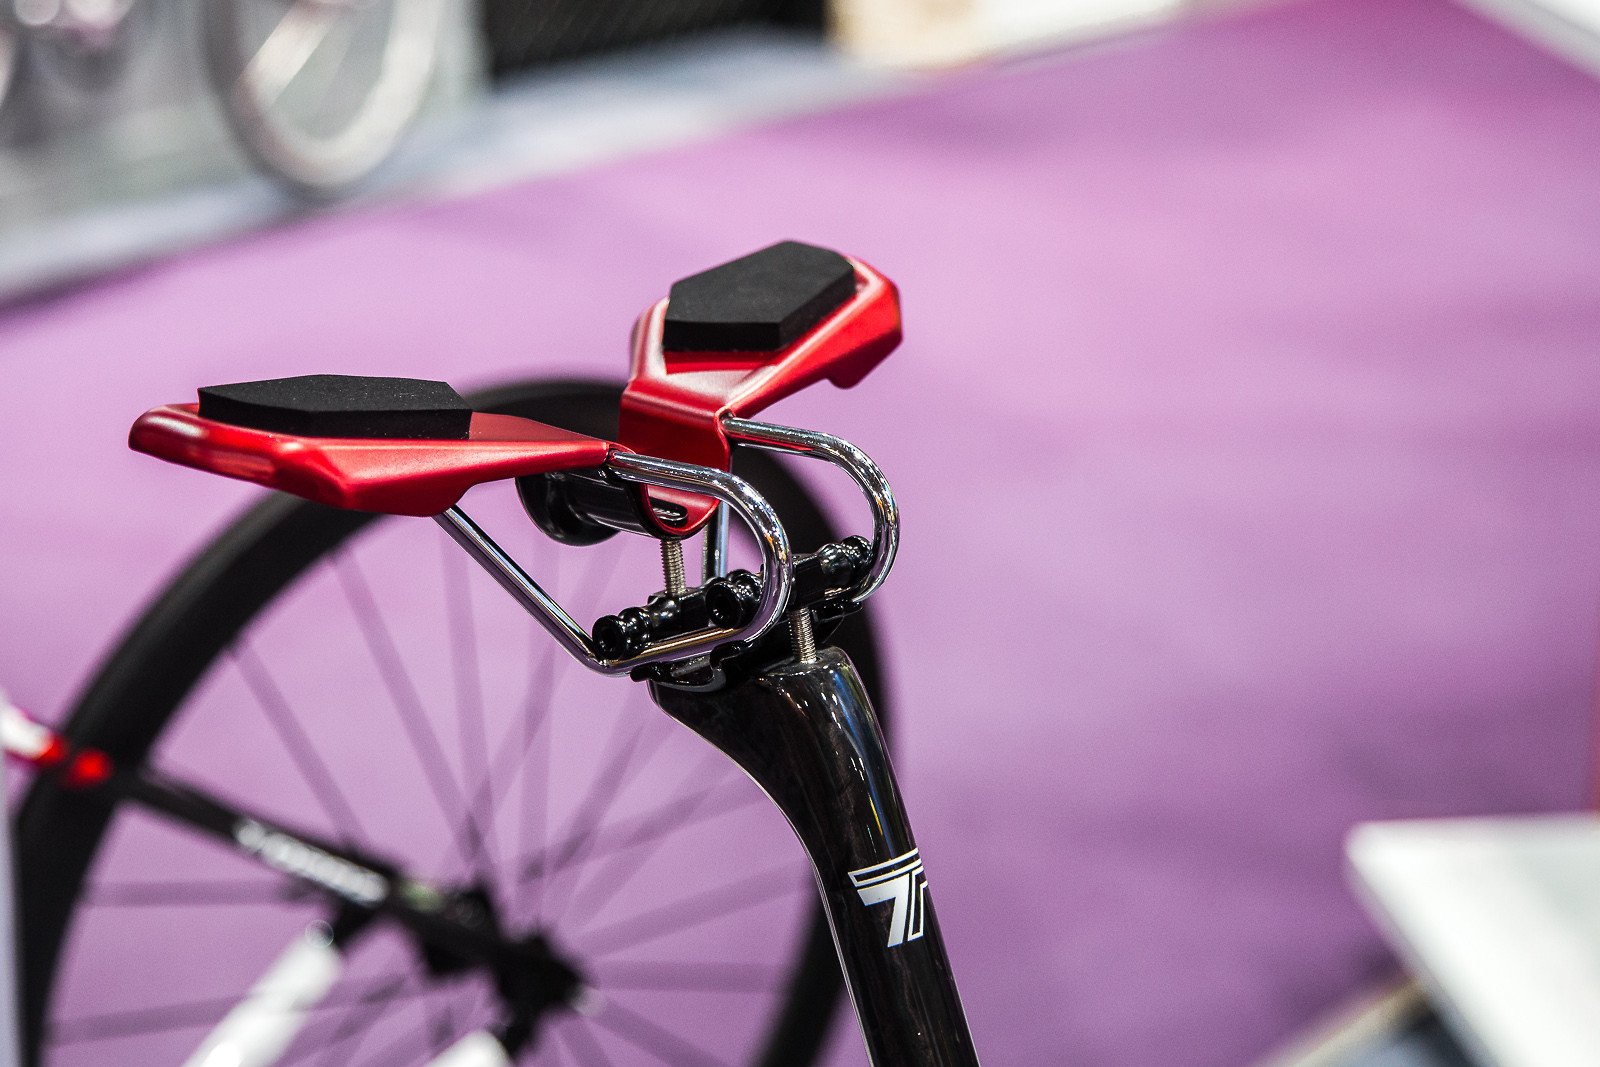 Uber Comfy-looking - LTrumpore - Mountain Biking Pictures - Vital MTB